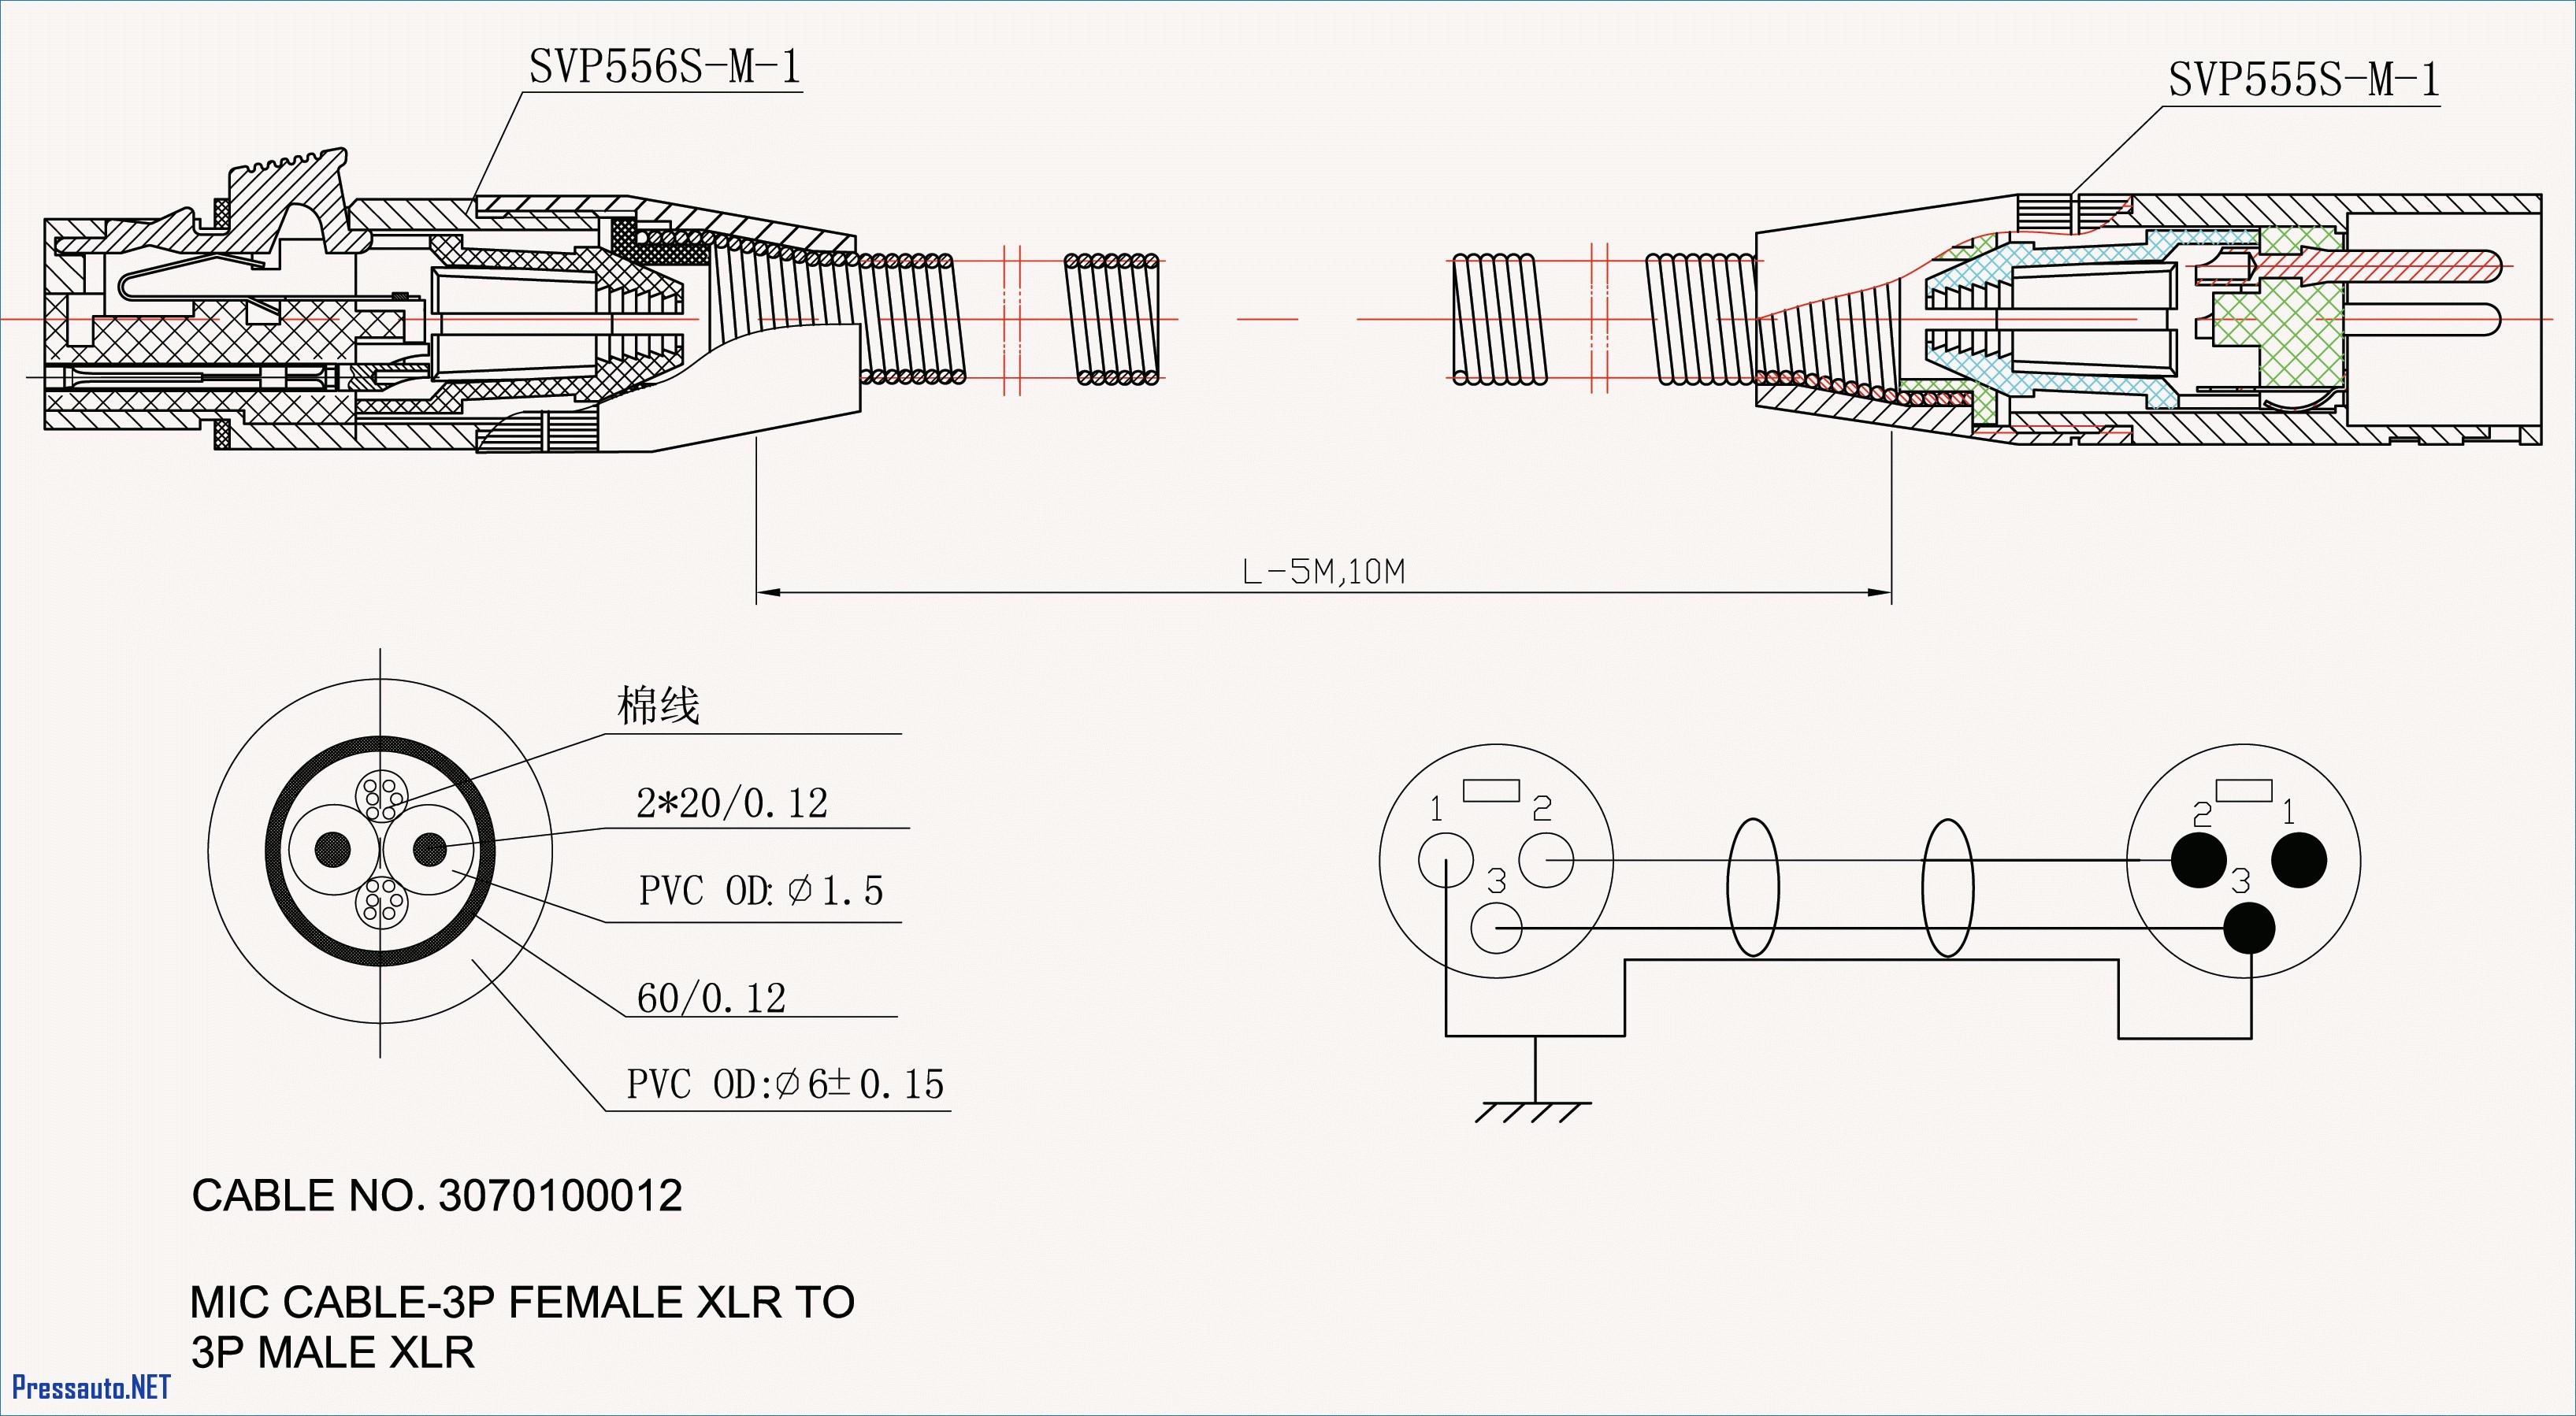 4 Prong Twist Lock Plug Wiring Diagram Inspirational 3 Wire Microphone Wiring Diagram Webtor